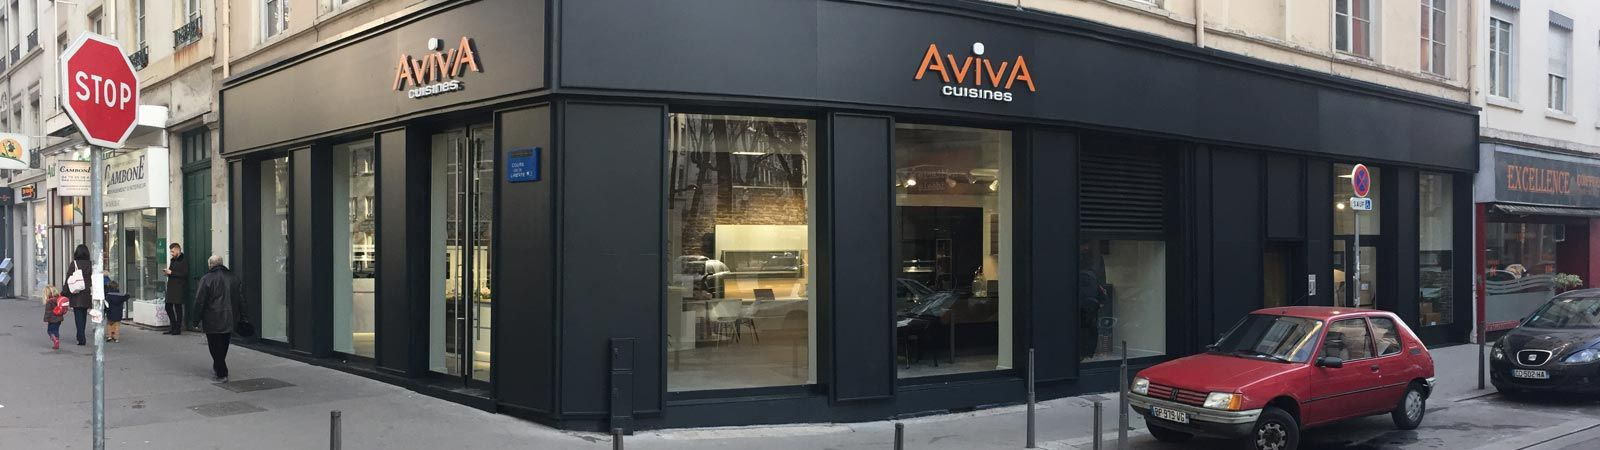 Cuisiniste Lyon Centre Ville Magasin De Cuisine Aviva Lyon